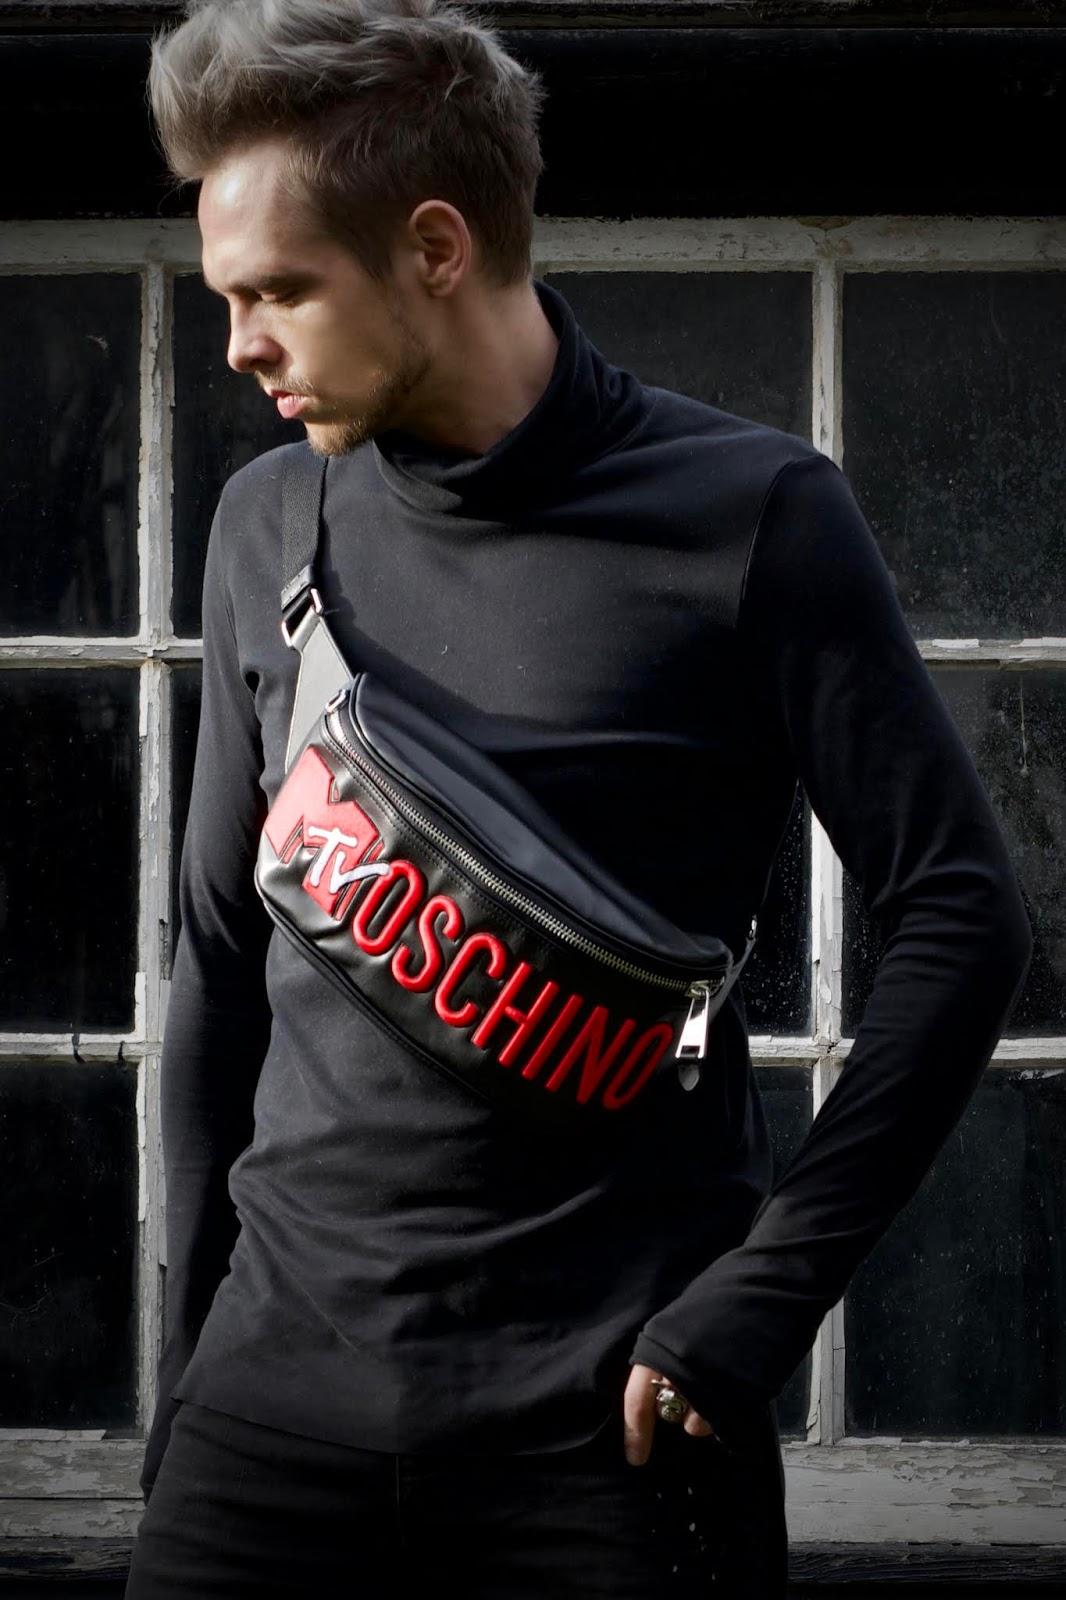 Hmoschino H&M Moschino Jeremy Scott Mens Street Stlye